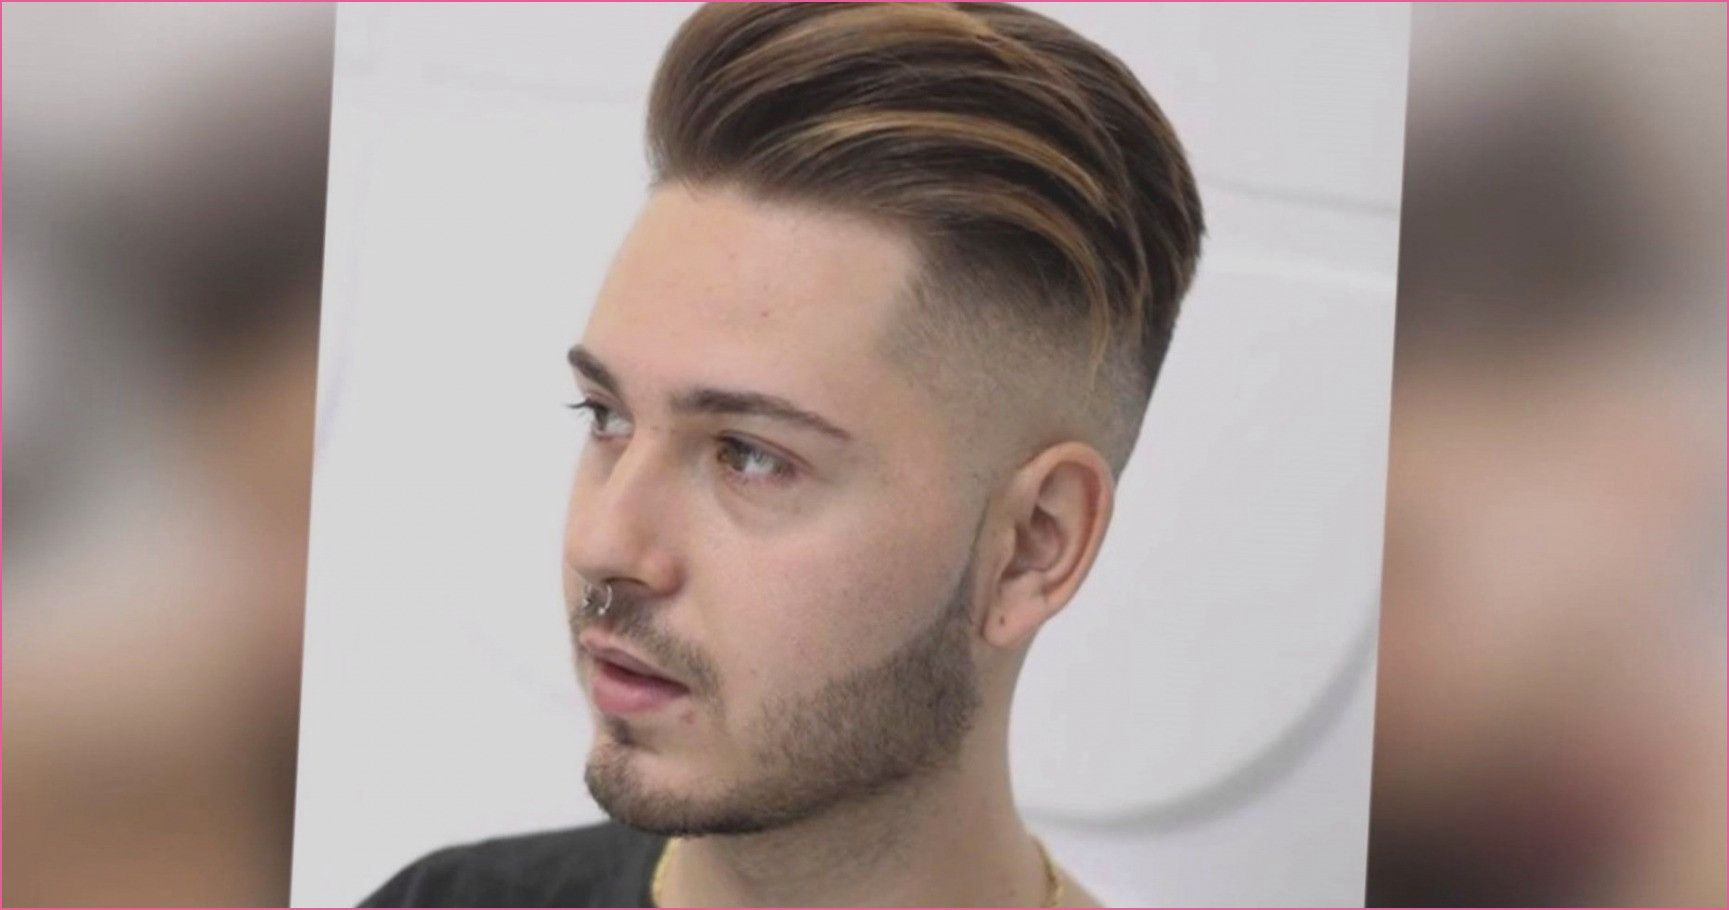 männer haarschnitt mit übergang in 2020 | haare stylen